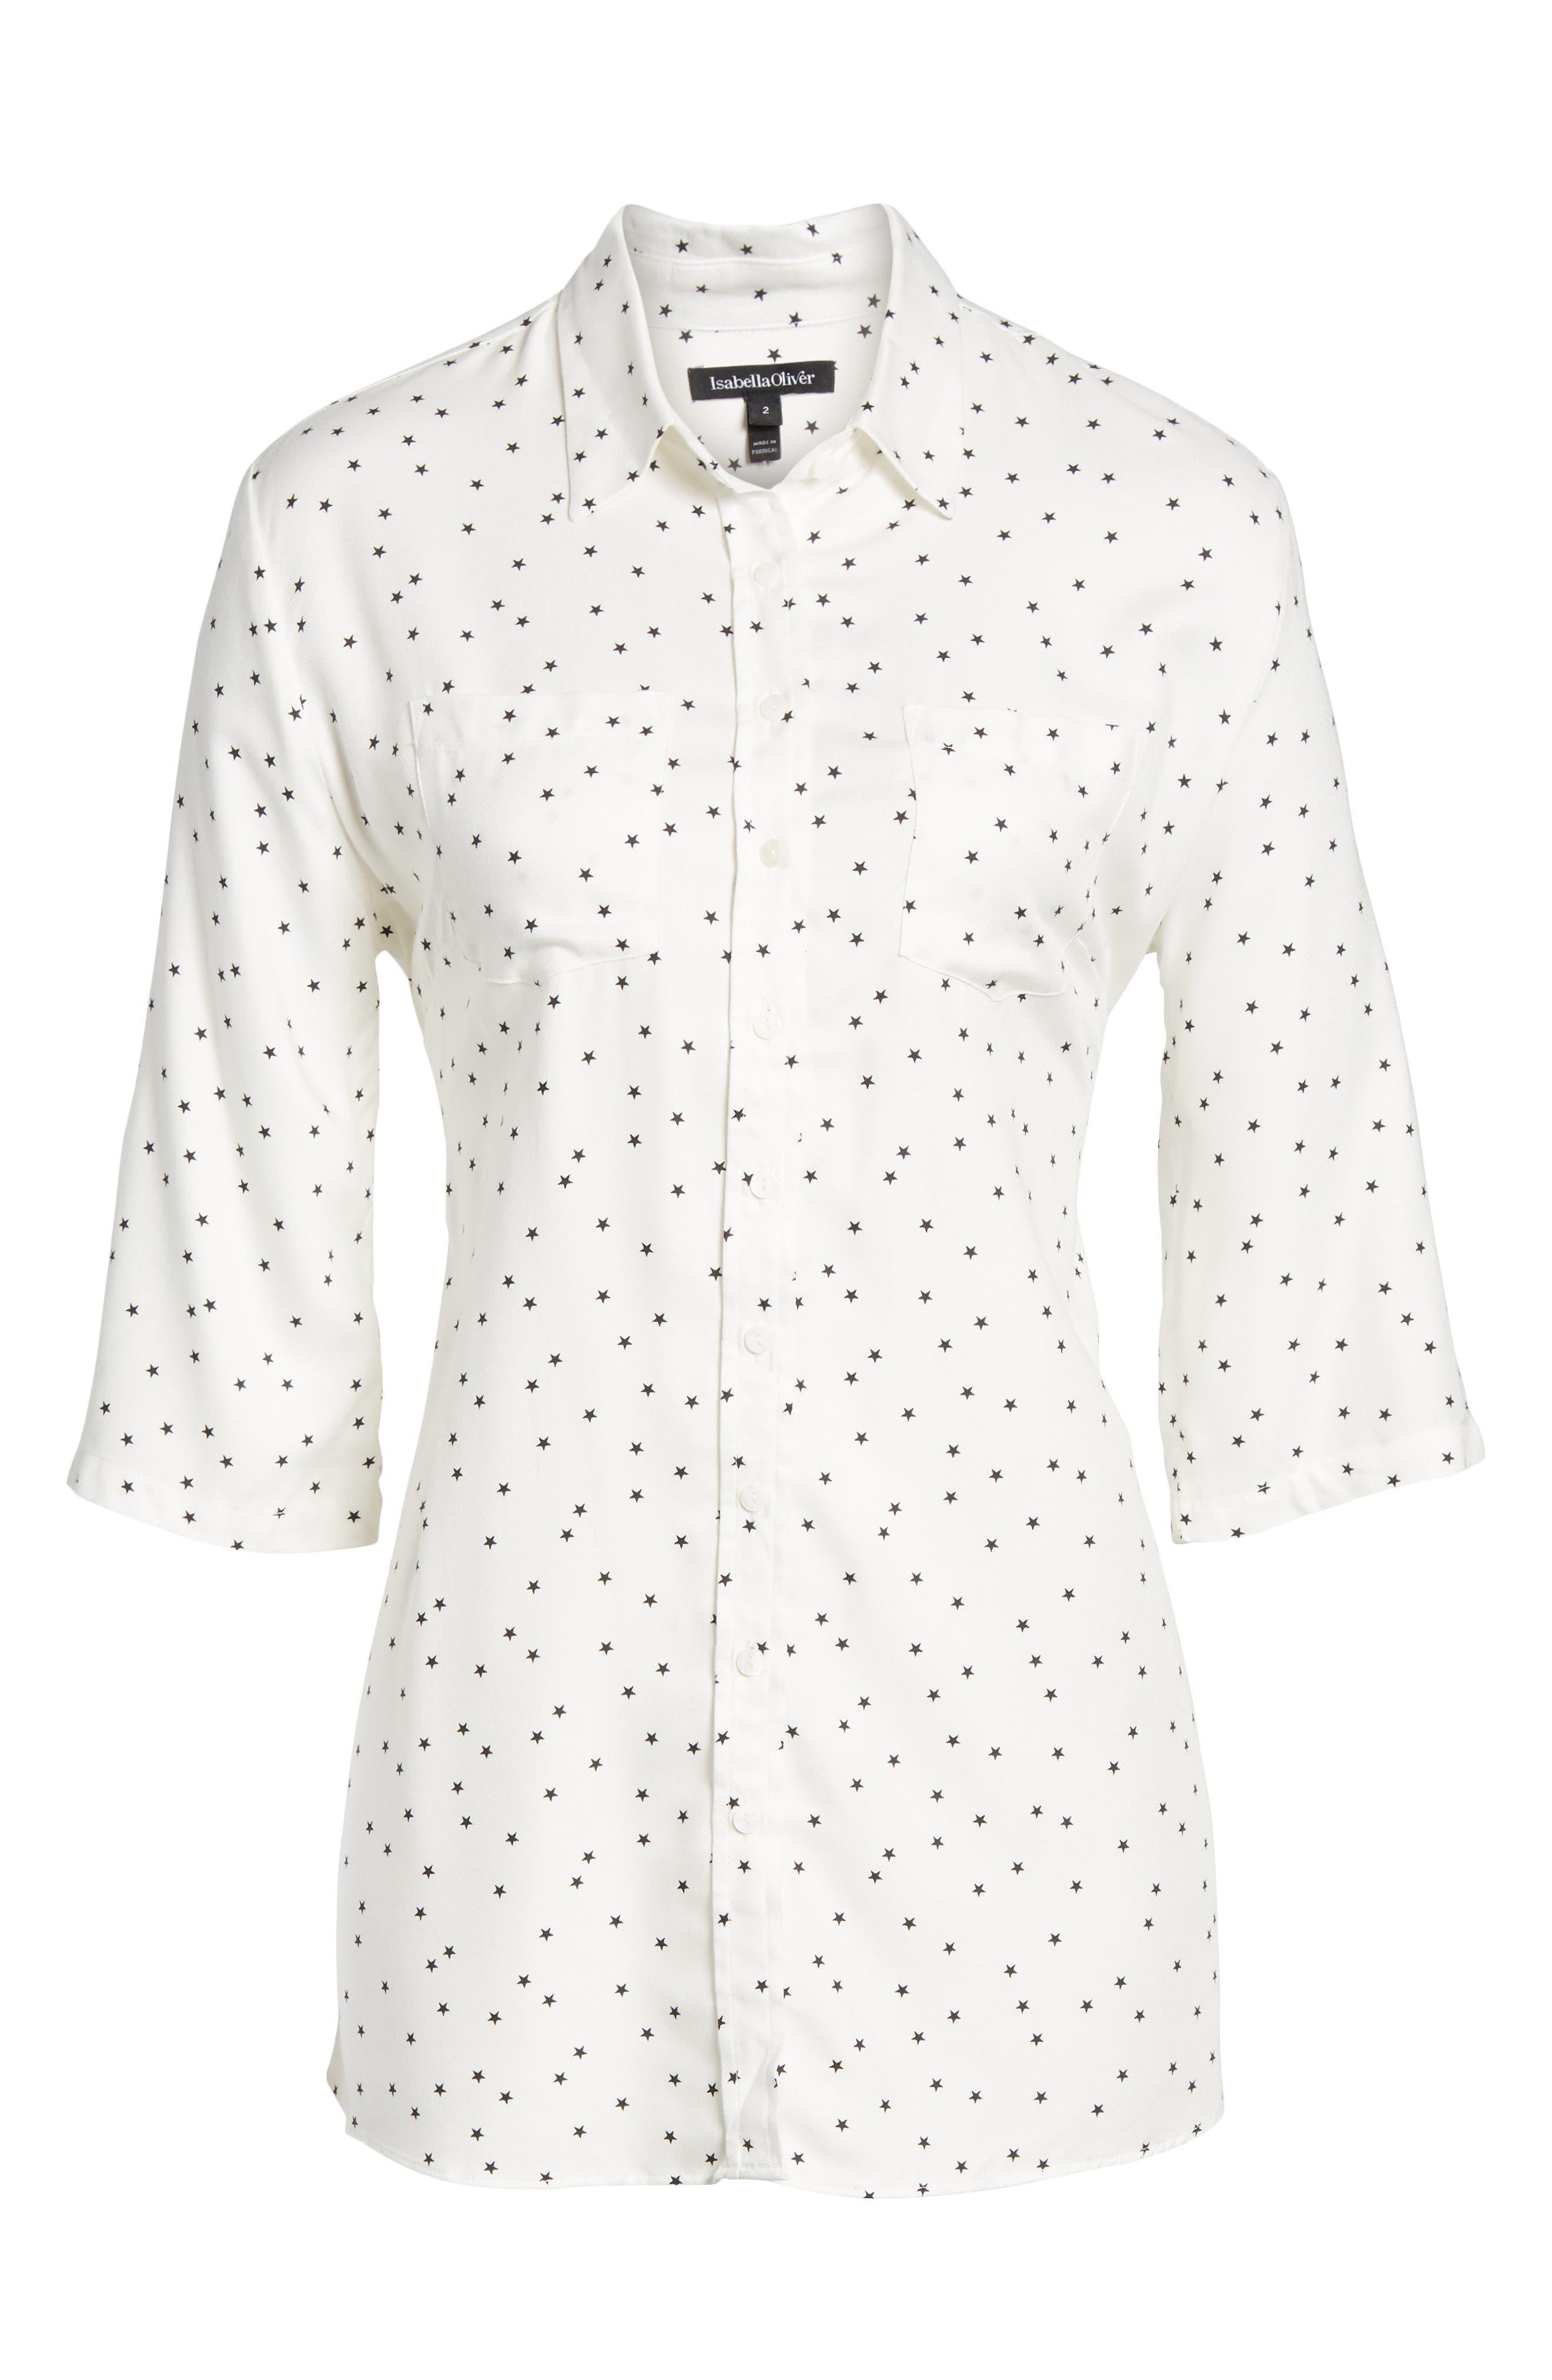 Selina Maternity Shirt,                             Alternate thumbnail 6, color,                             Off White Star Print